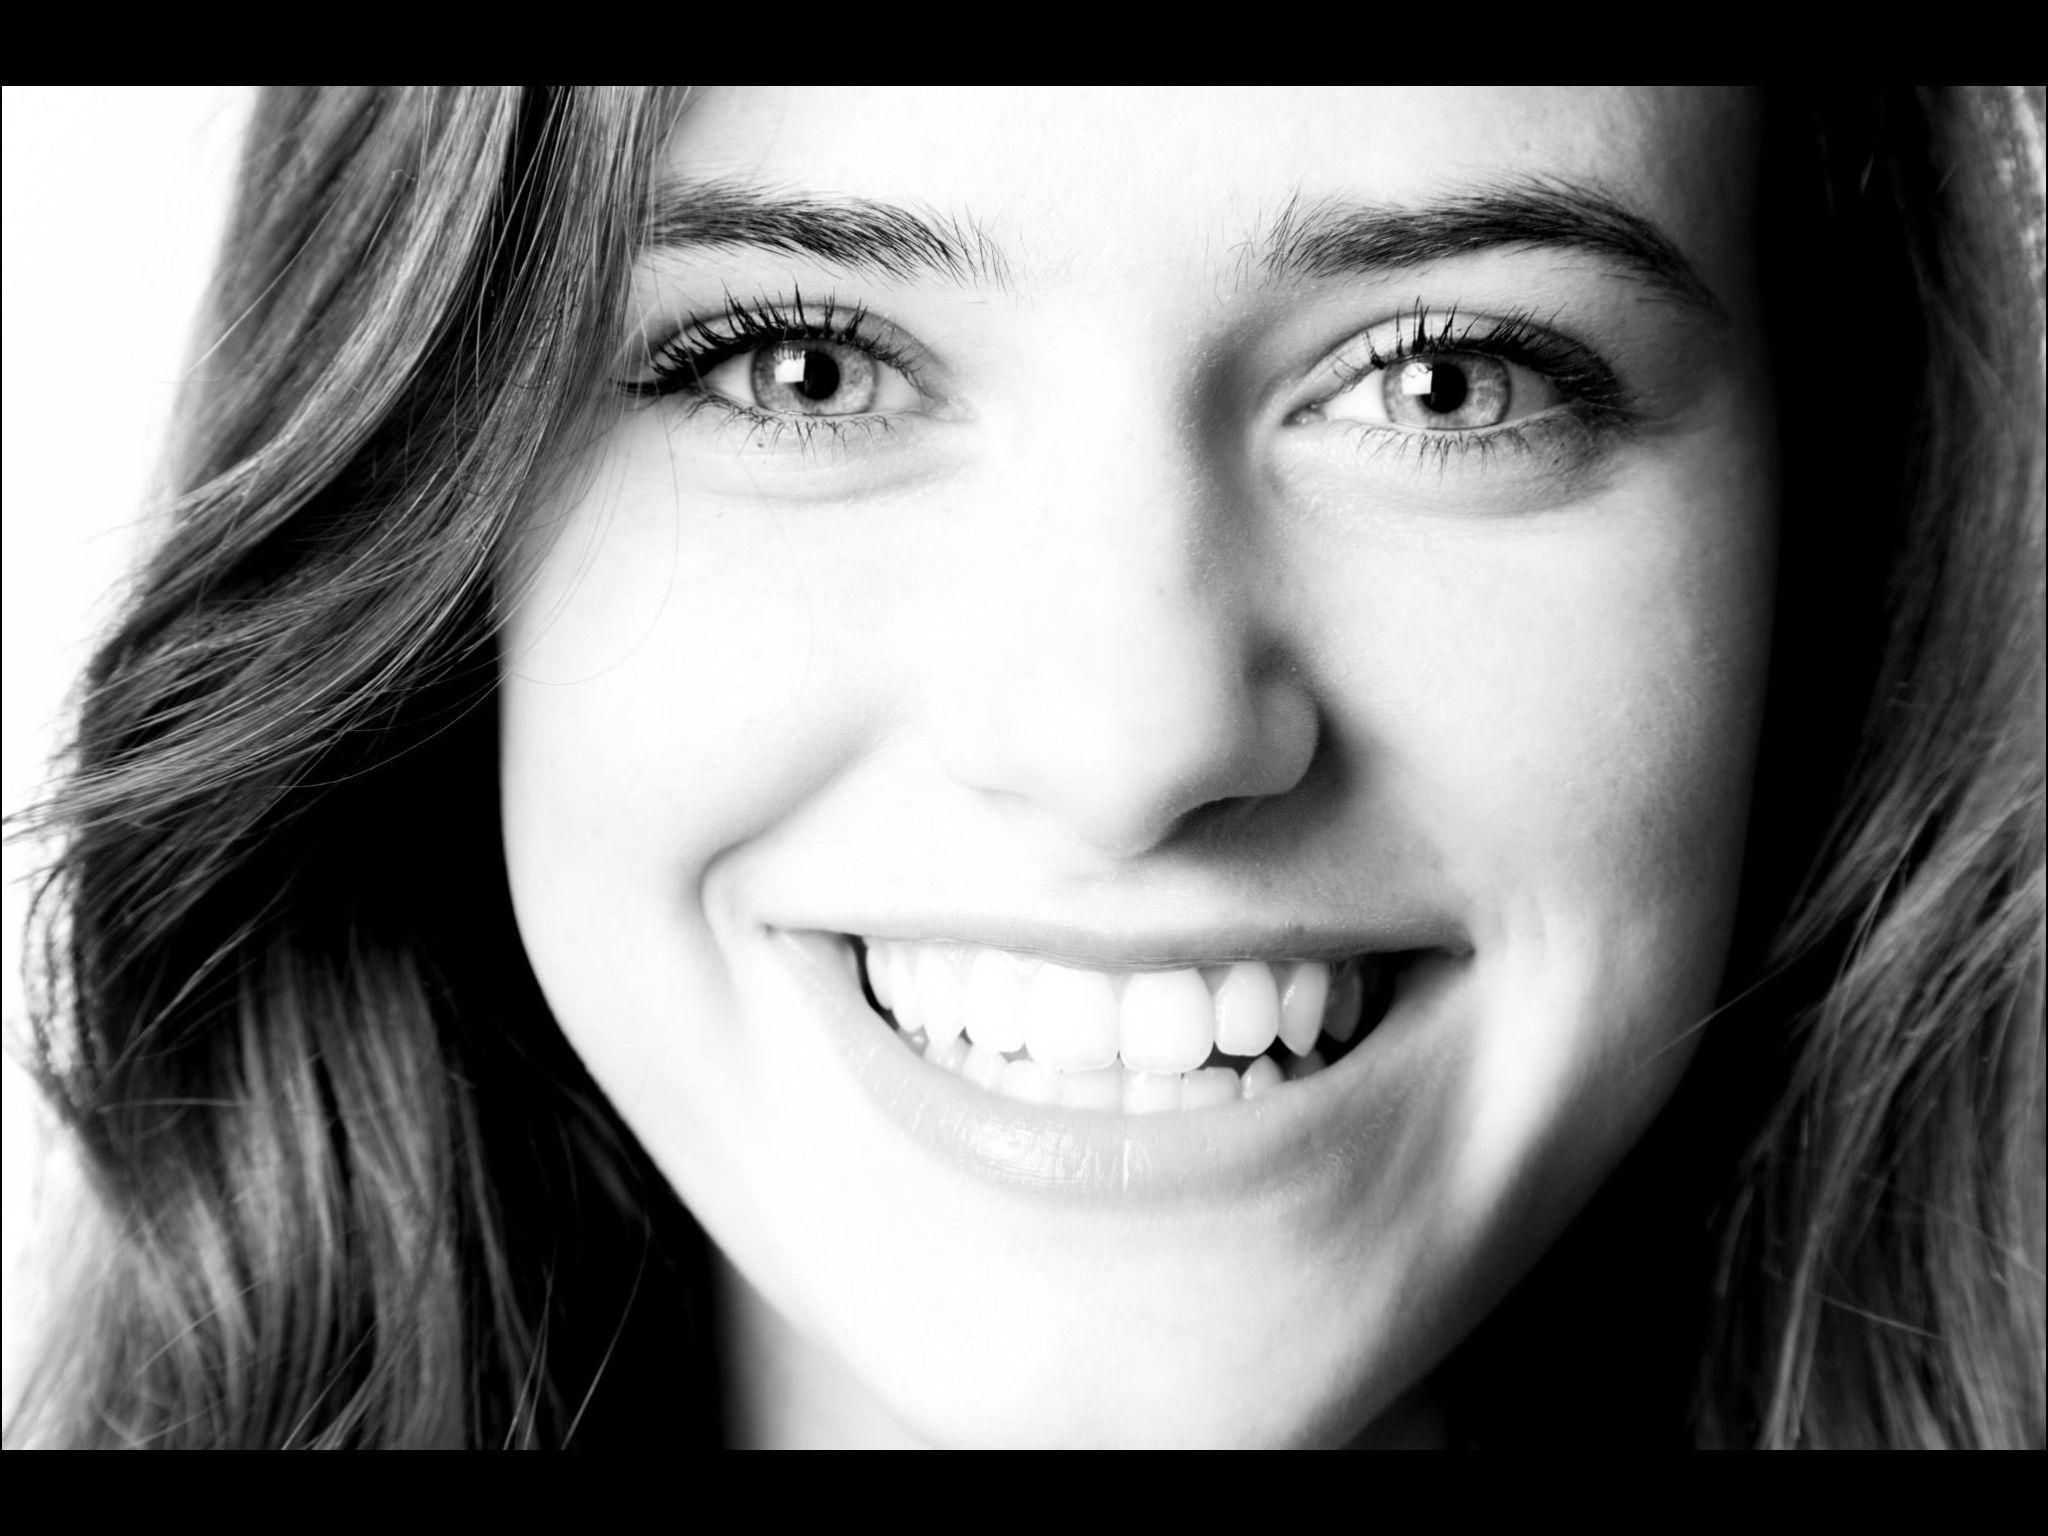 True self, Model: Hannah Gilmore https://www.facebook.com/ZazoPhotography